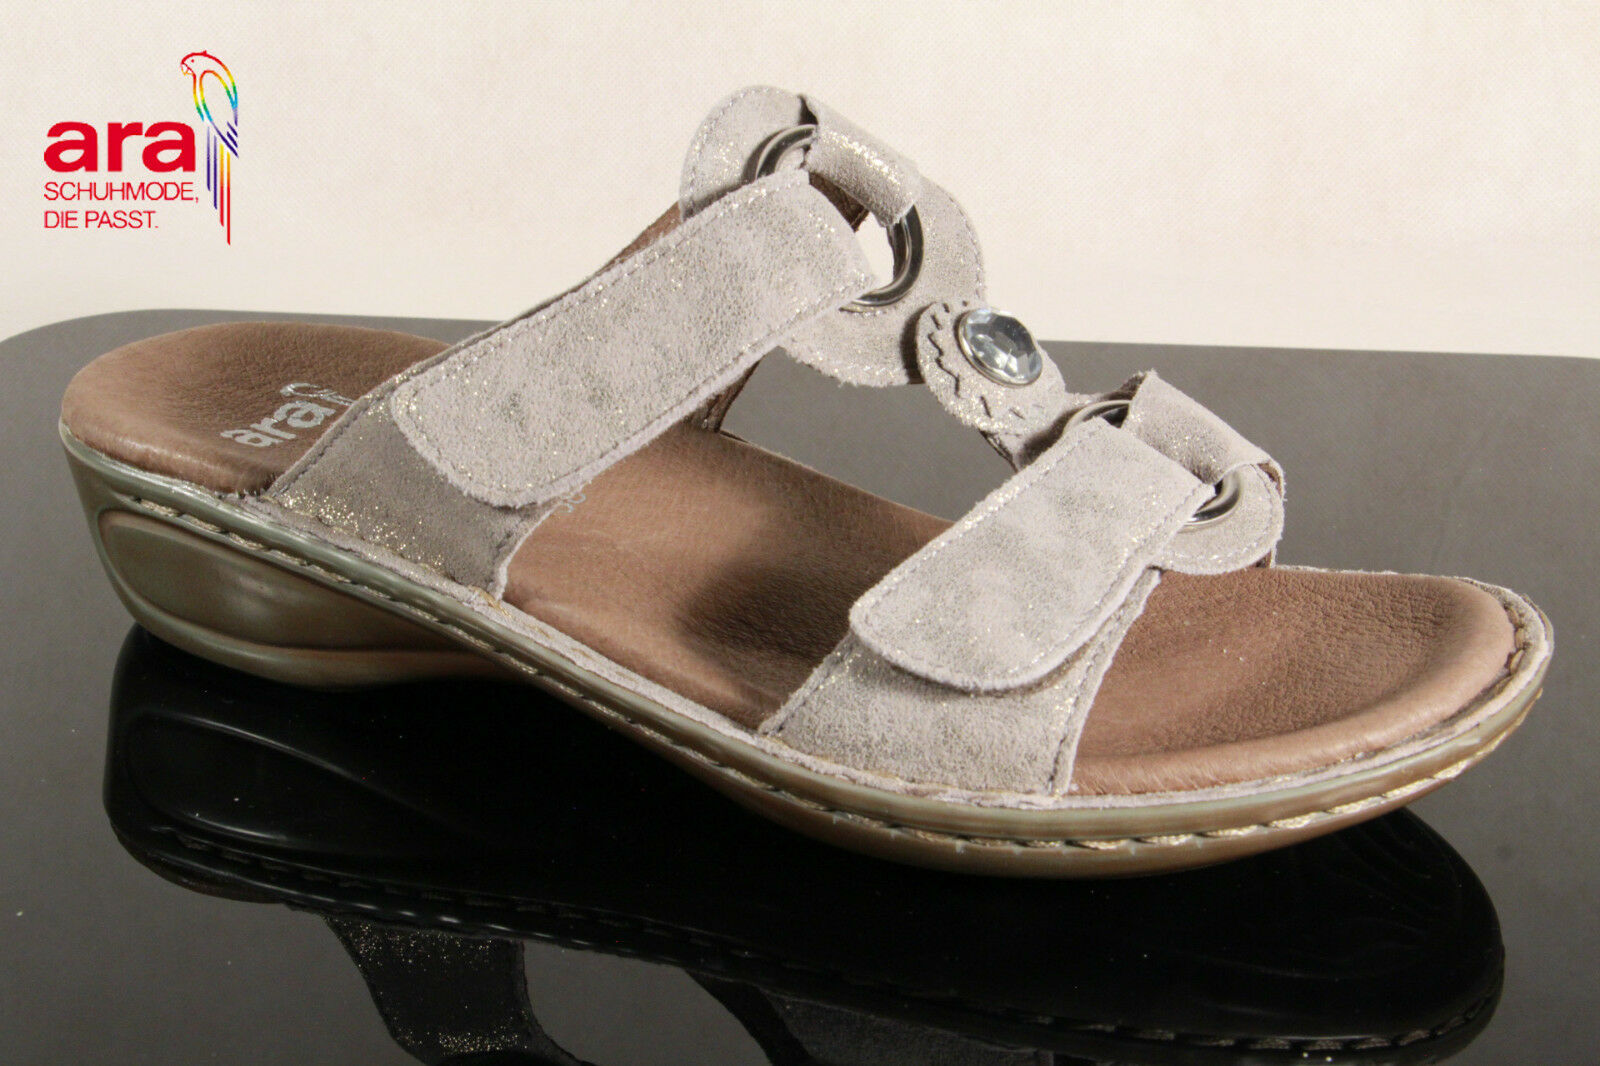 Ara Pantoletten Pantolette Pantoffel Clogs Hausschuhe Echtleder grau grau grau 27273 NEU  2e08b2